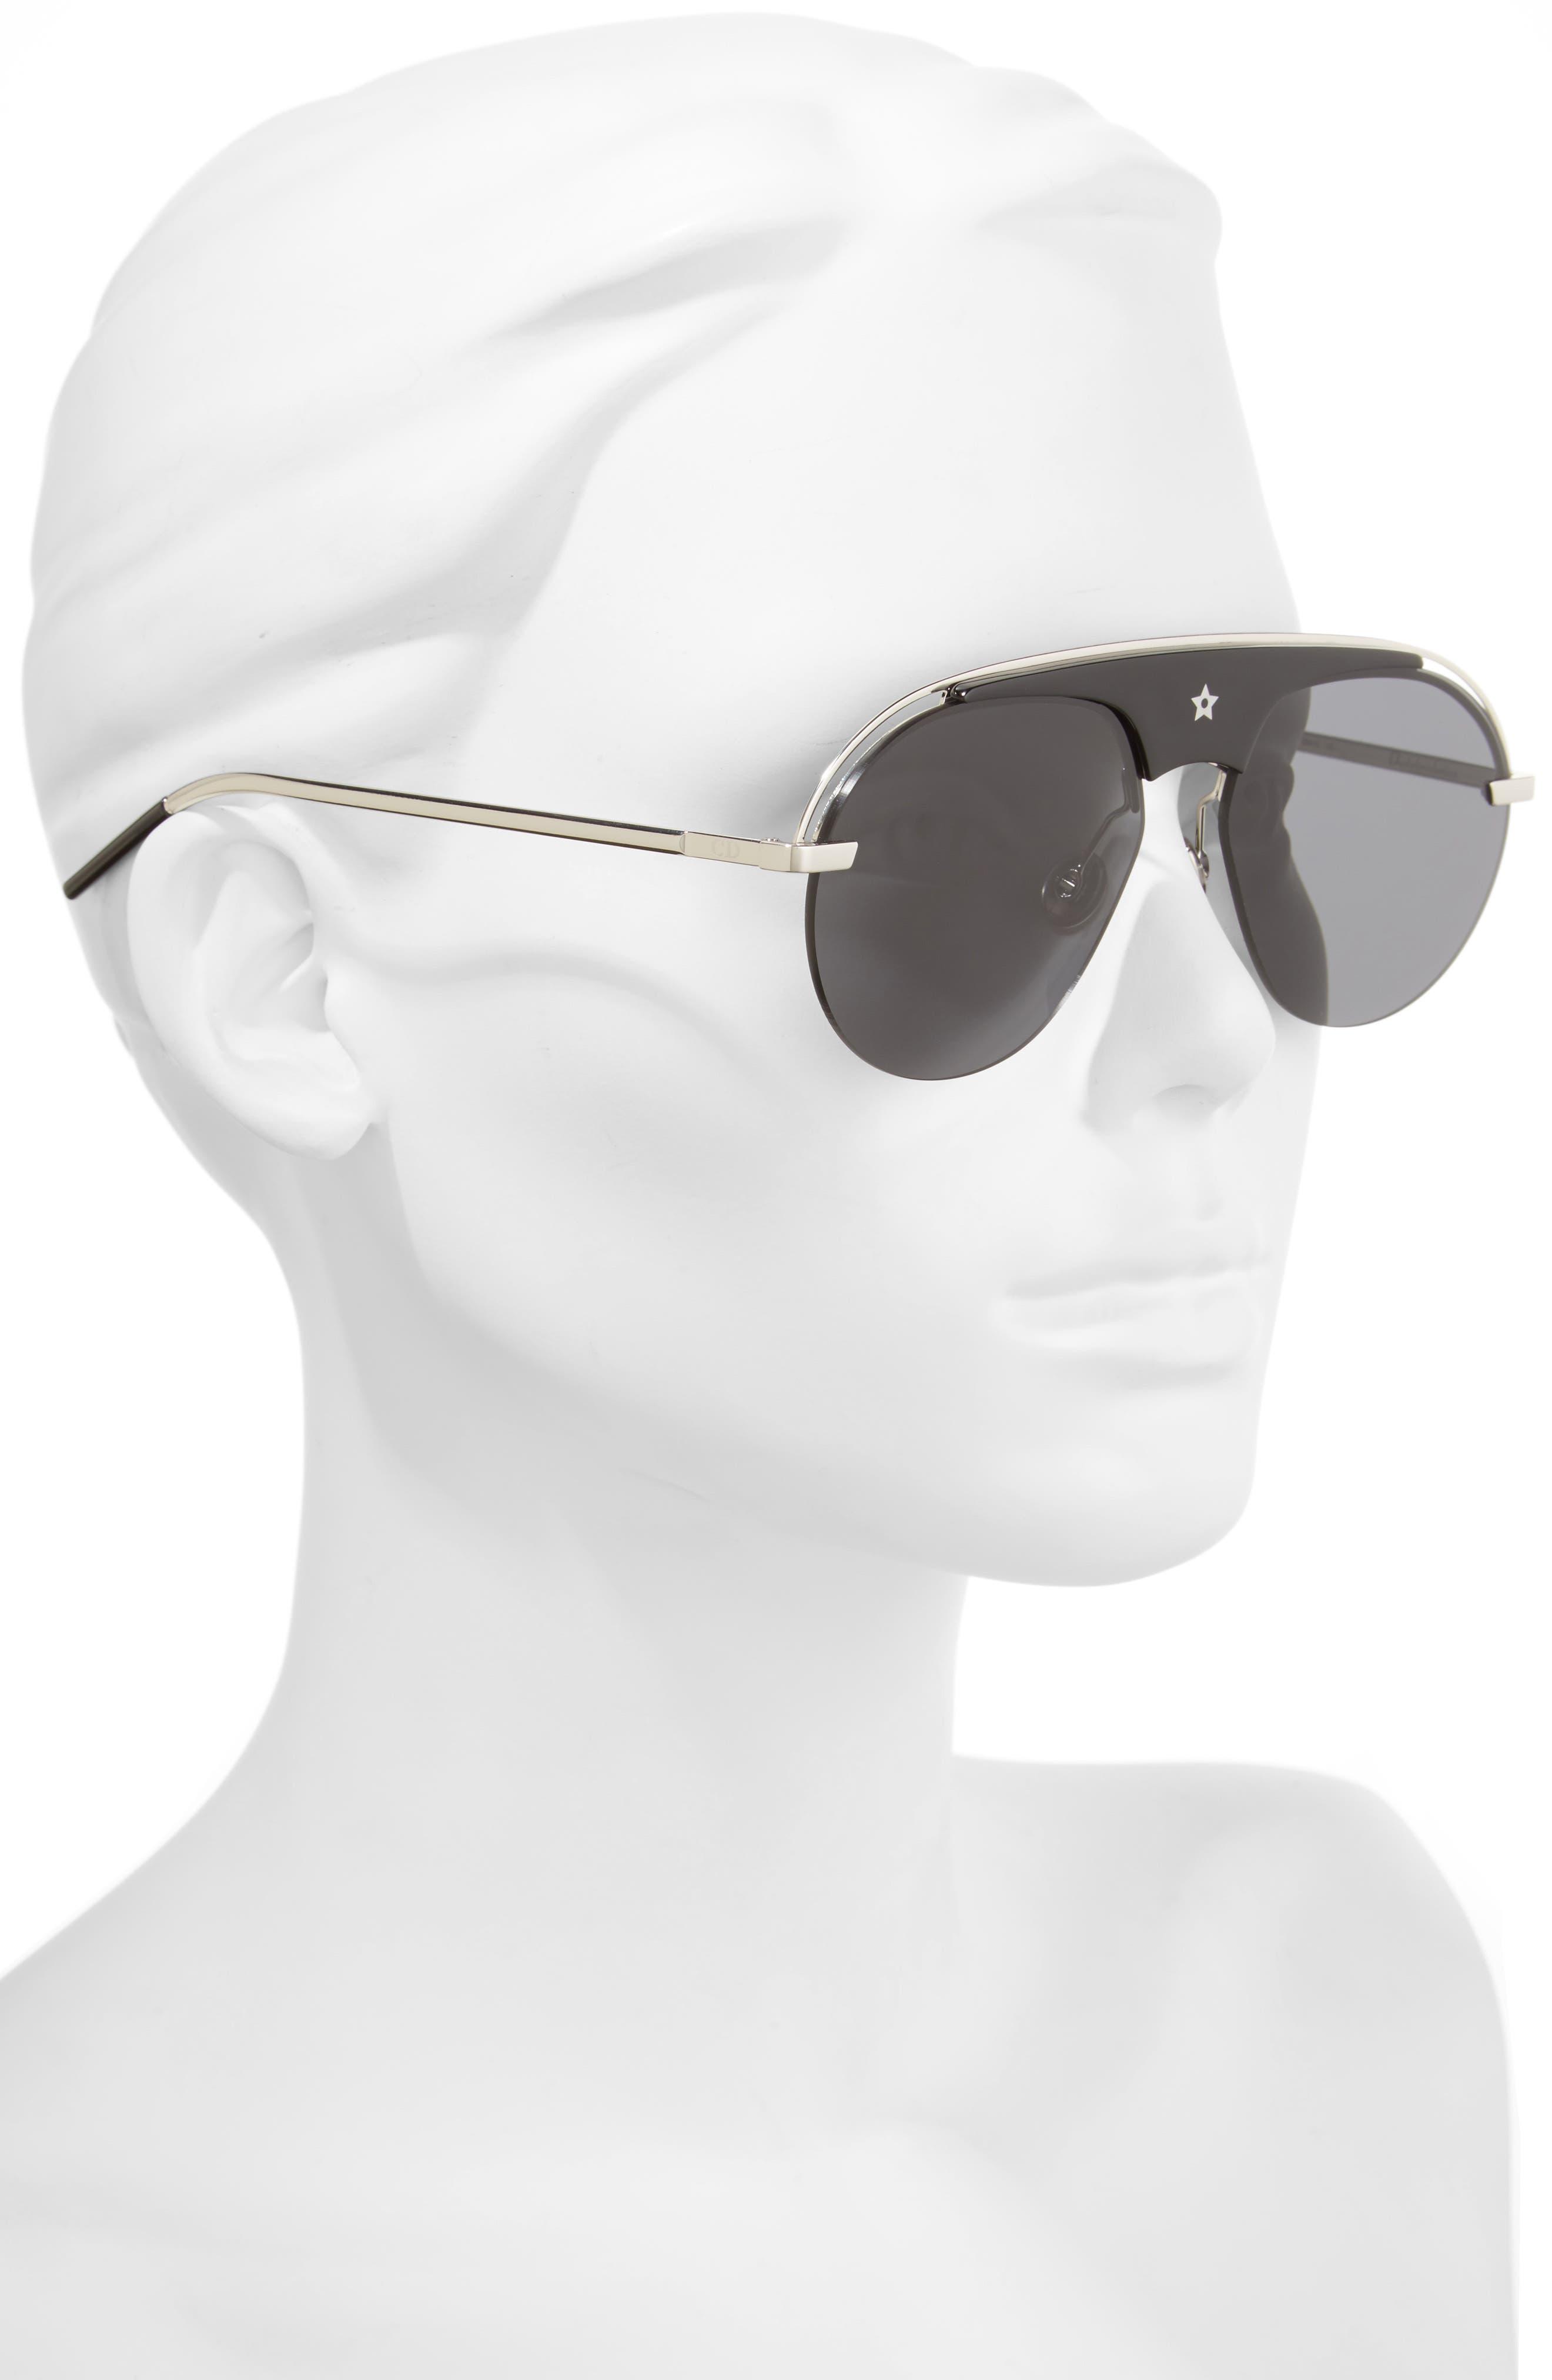 Revolution 58mm Aviator Sunglasses,                             Alternate thumbnail 2, color,                             001